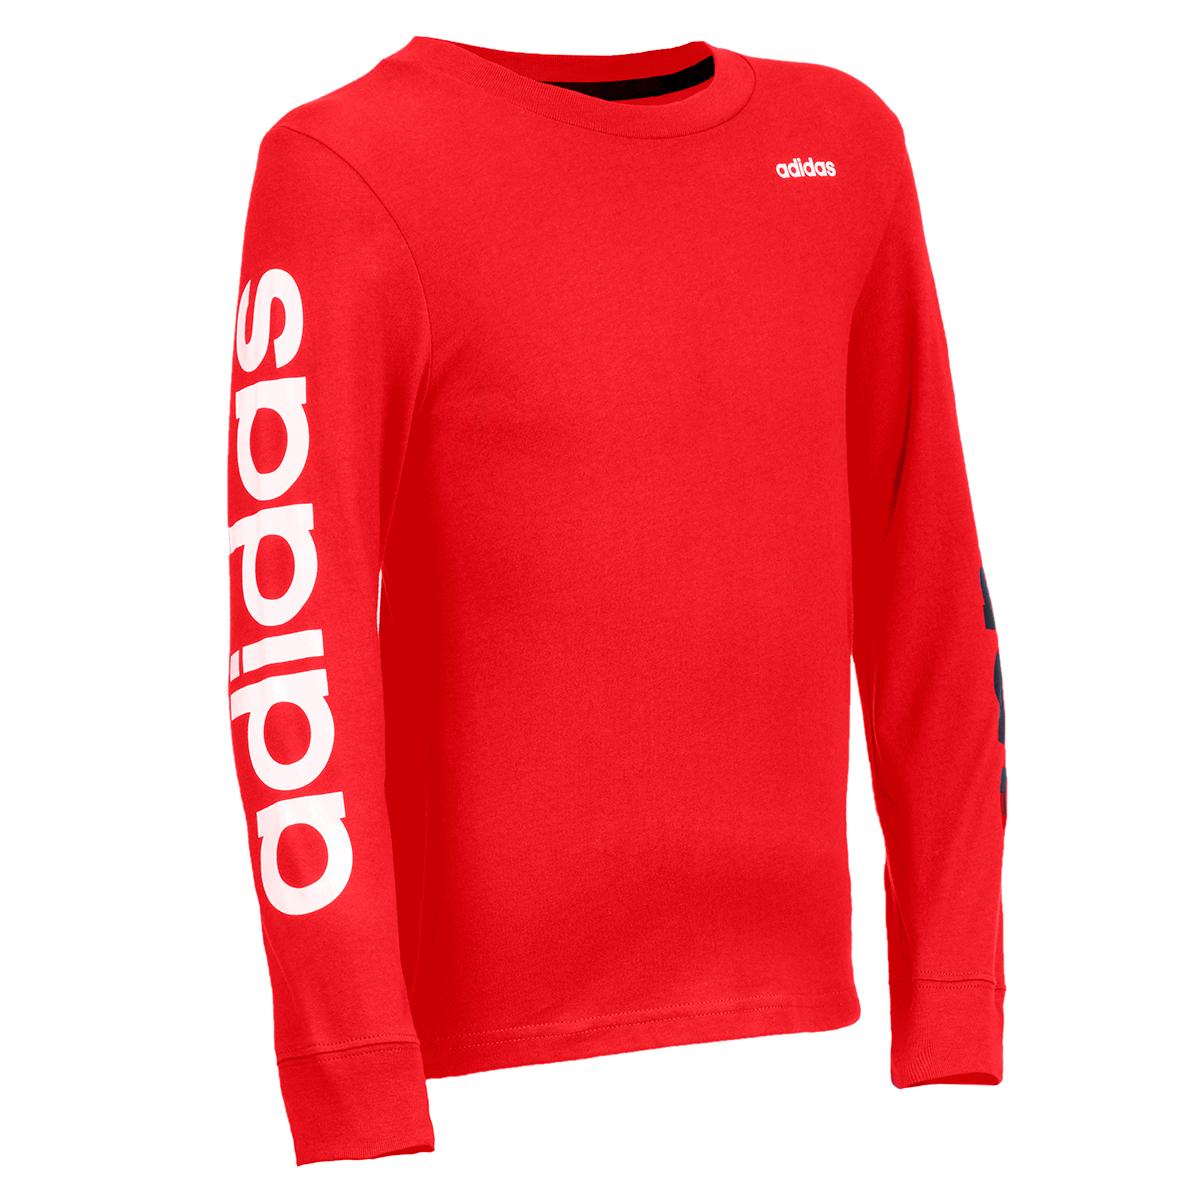 Adidas Big Boy's Long-Sleeve Linear Cotton Tee - Red, S